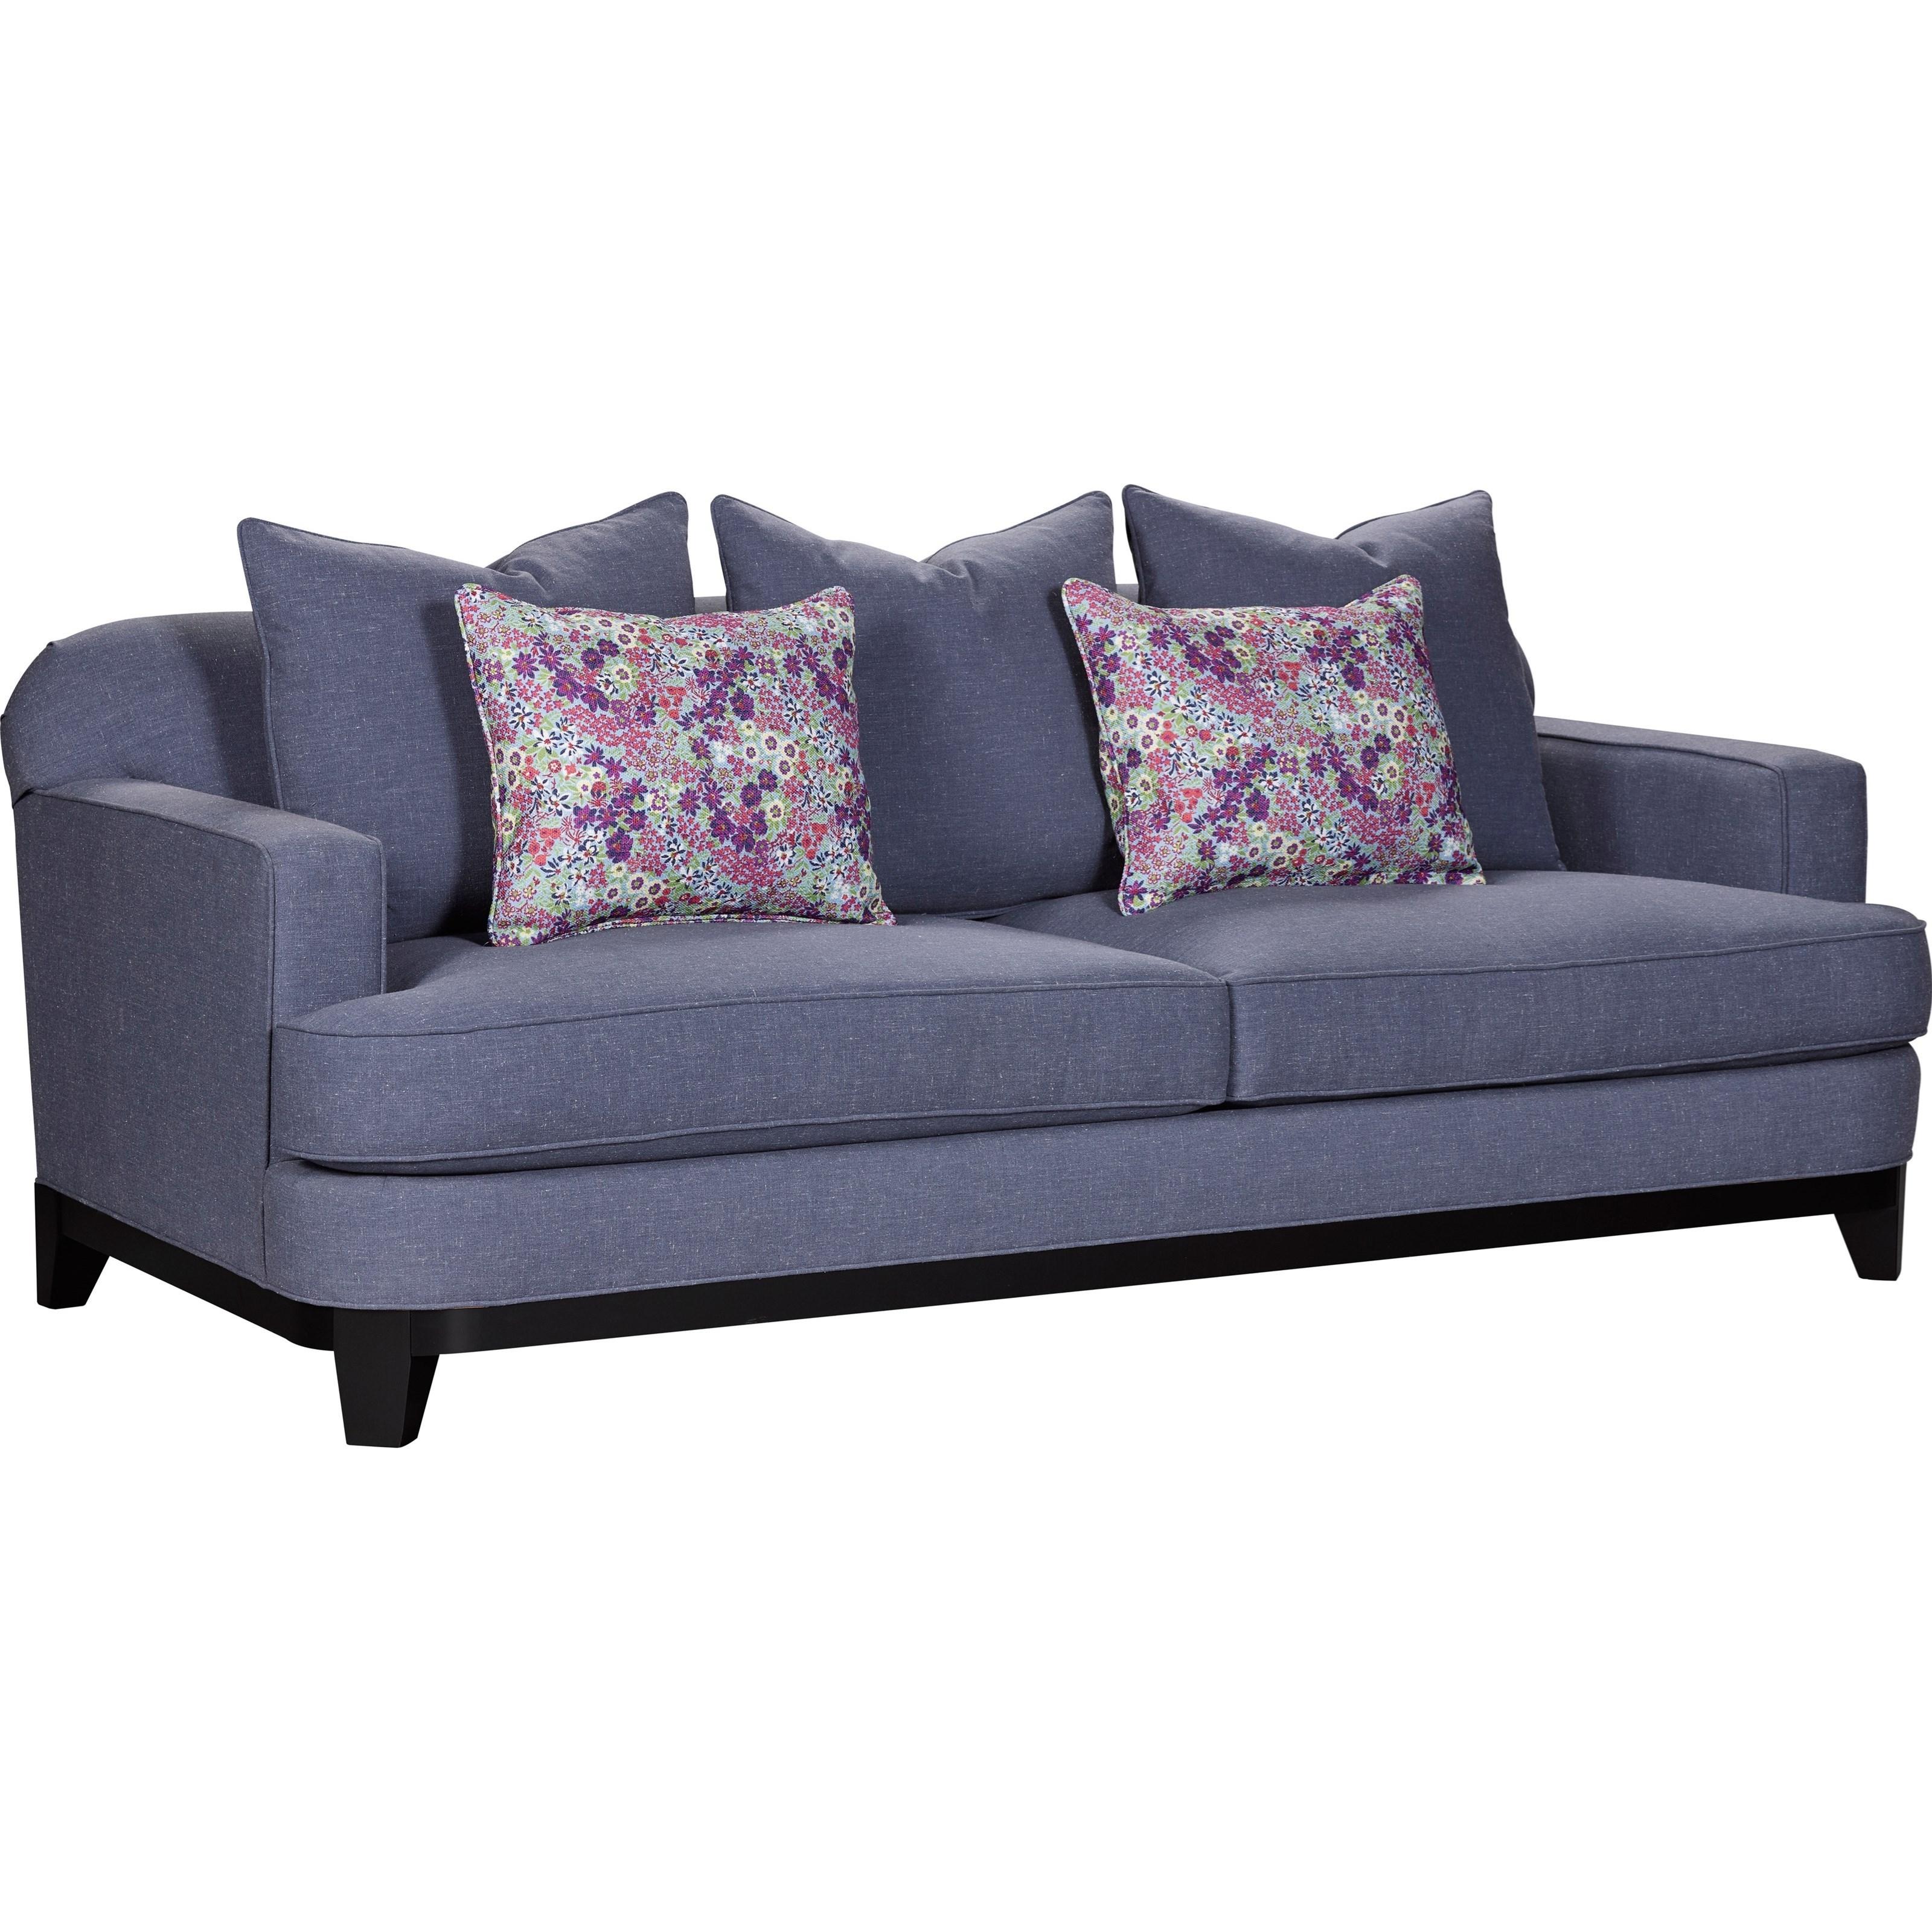 Broyhill Furniture AugustaSofa